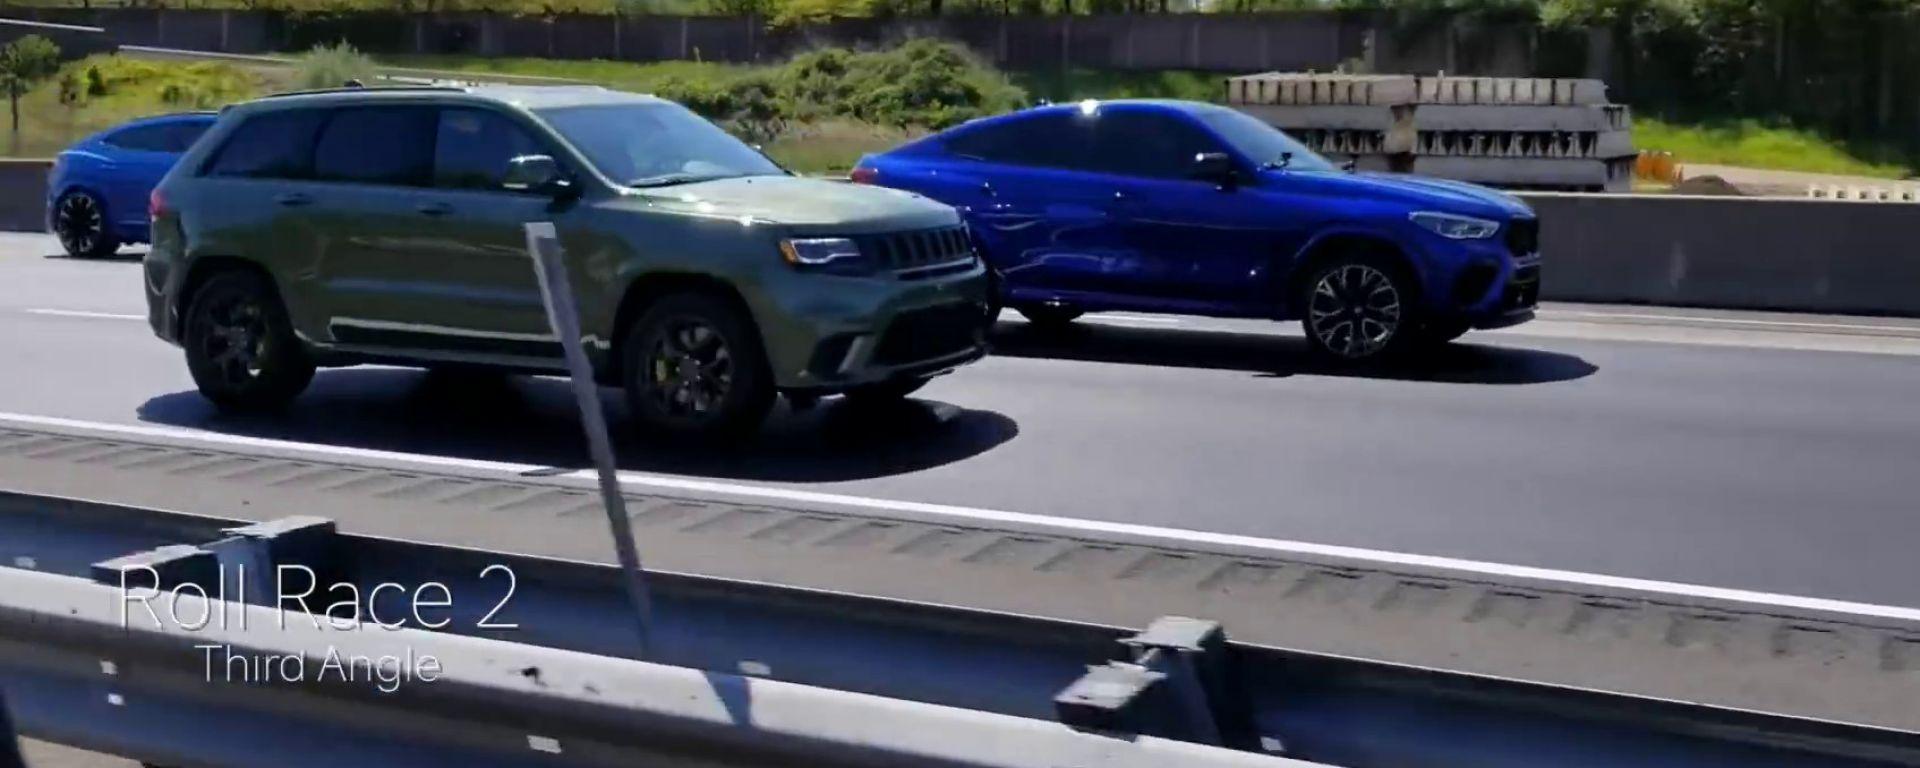 Lamborghini Urus vs Bmw X6 vs Jeep GC Trackhawk